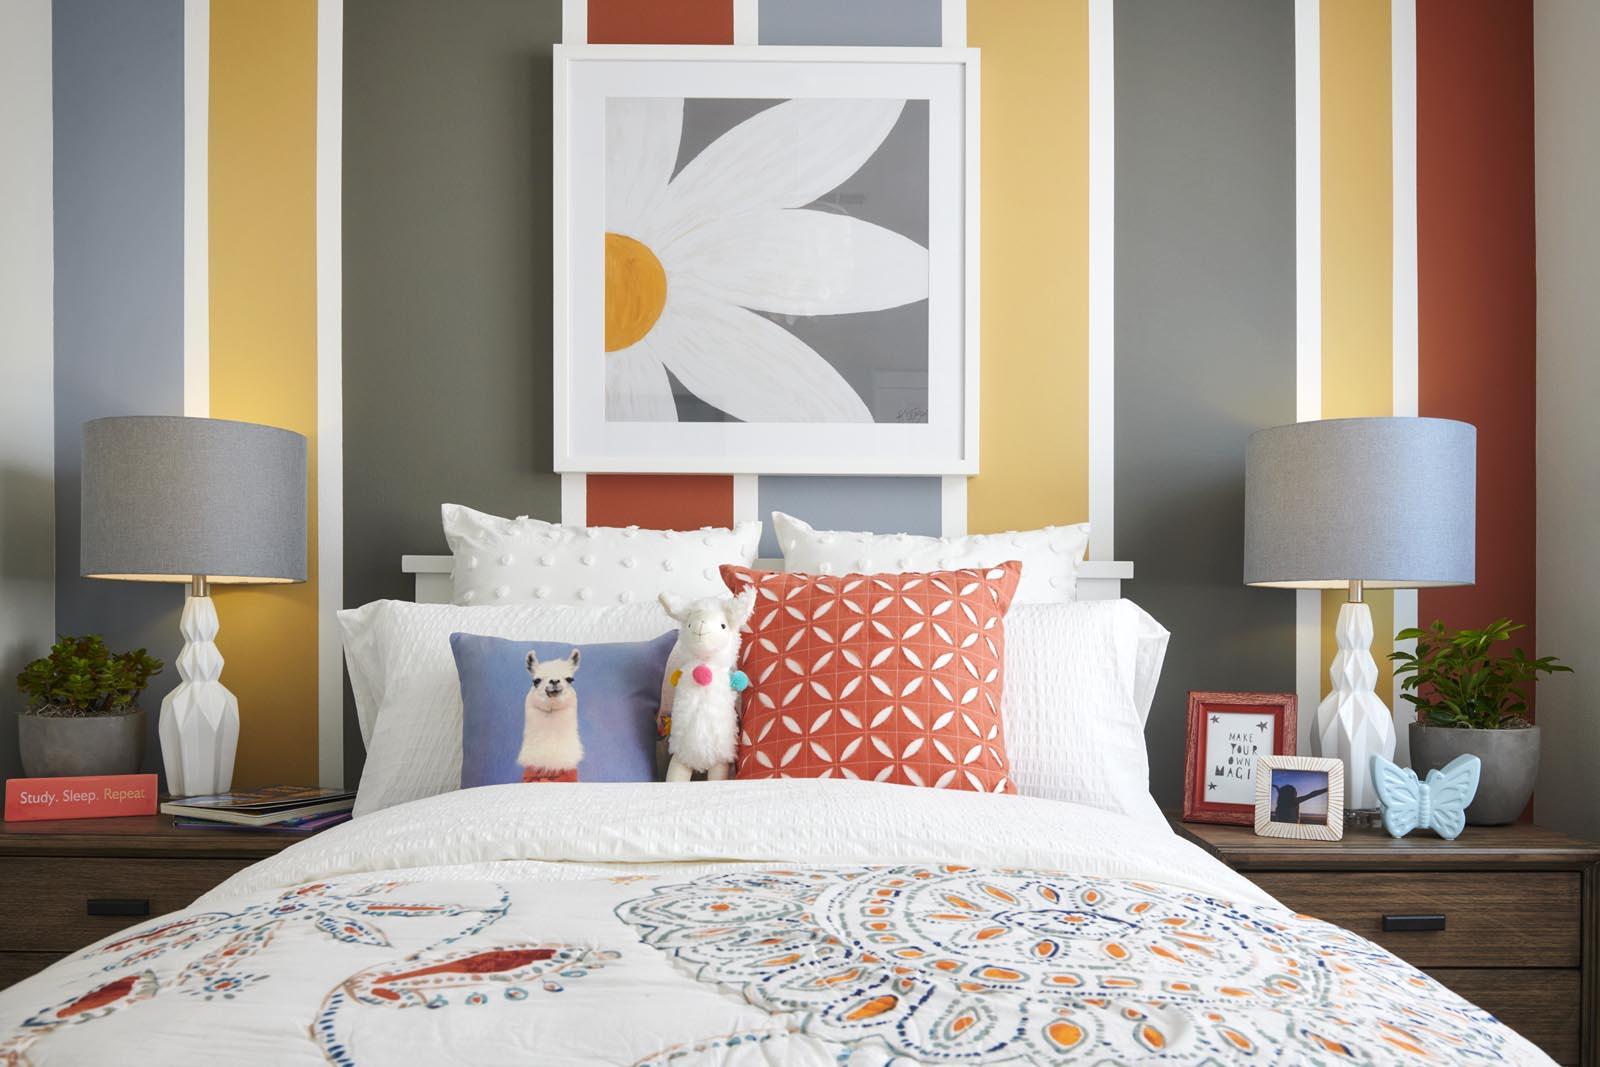 Bedroom   Residence 1   Enliven   New Homes in Rancho Cucamonga, CA   Van Daele Homes